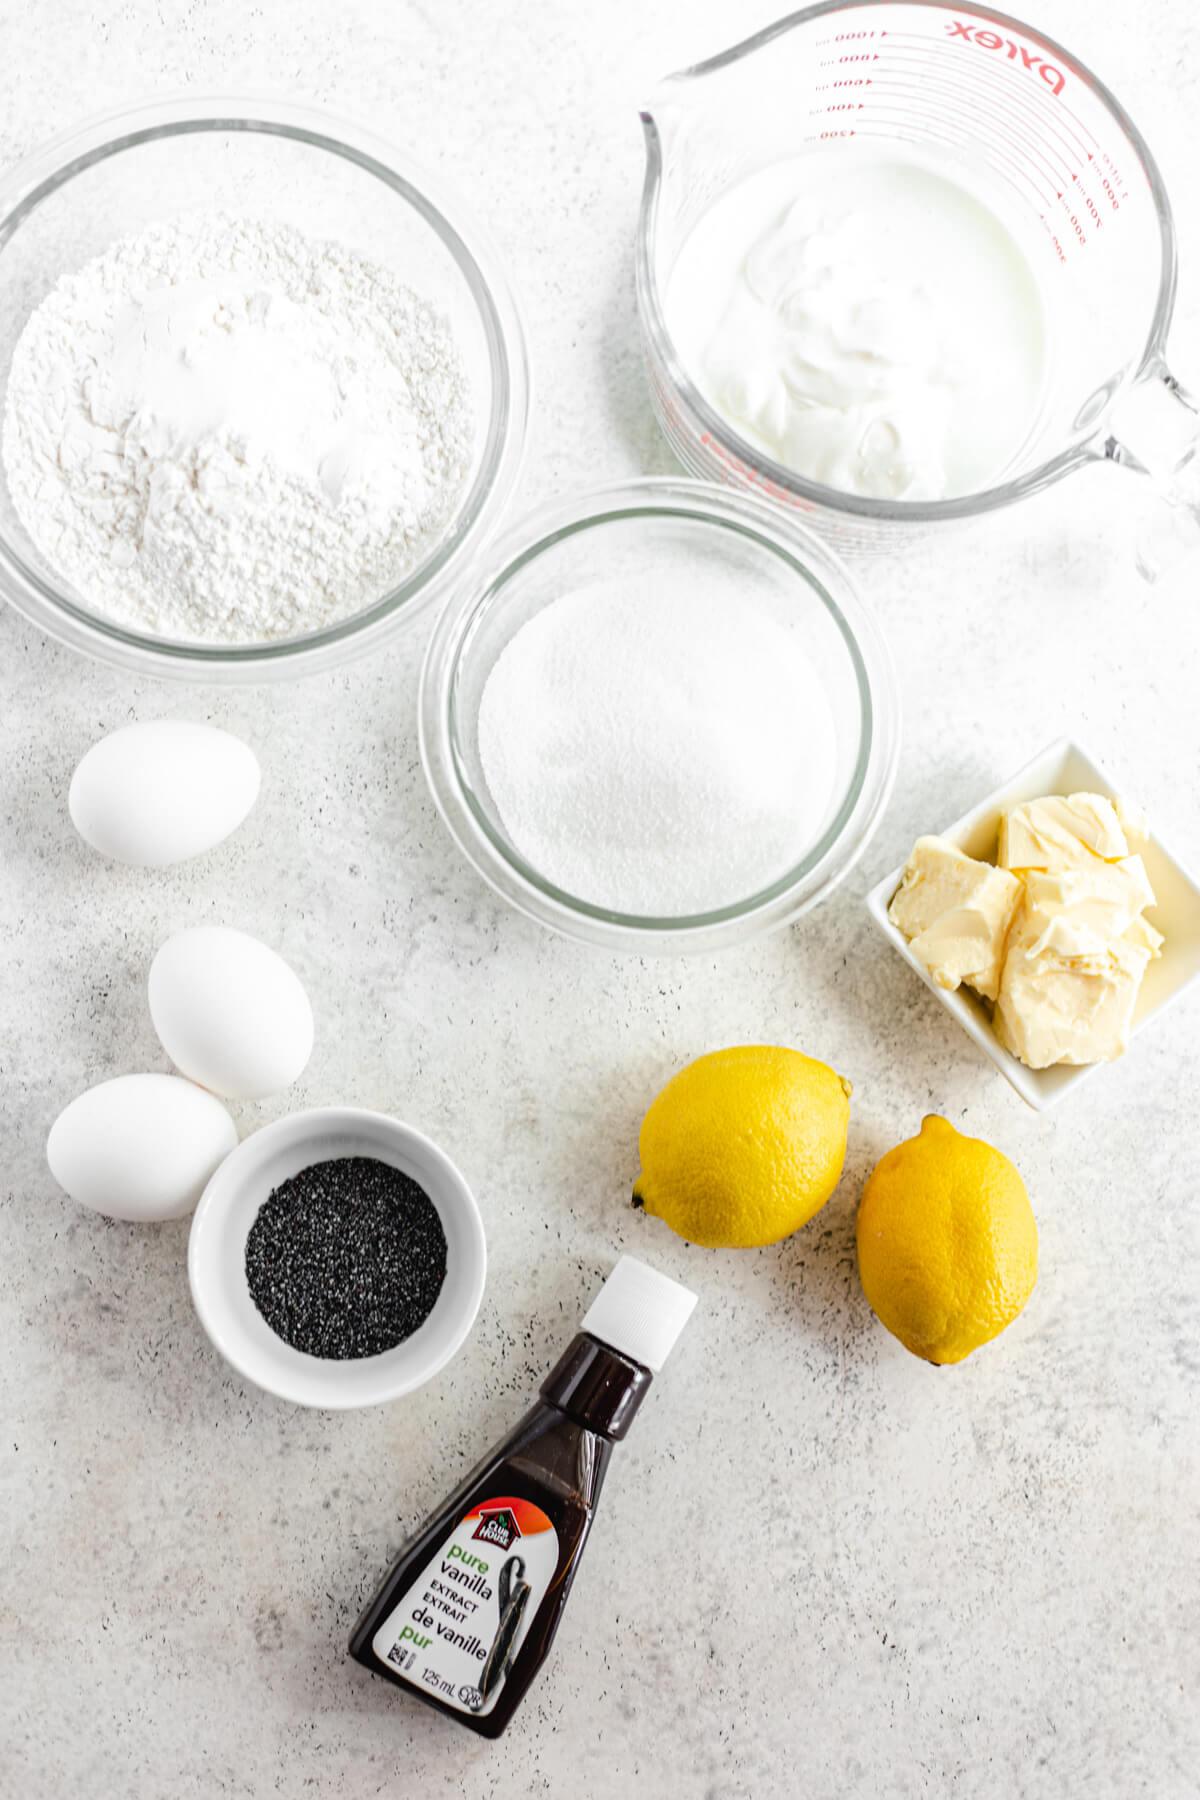 3 eggs, 2 lemons, butter, vanilla, sugar, flour, poppy seeds and buttermilk ingredients